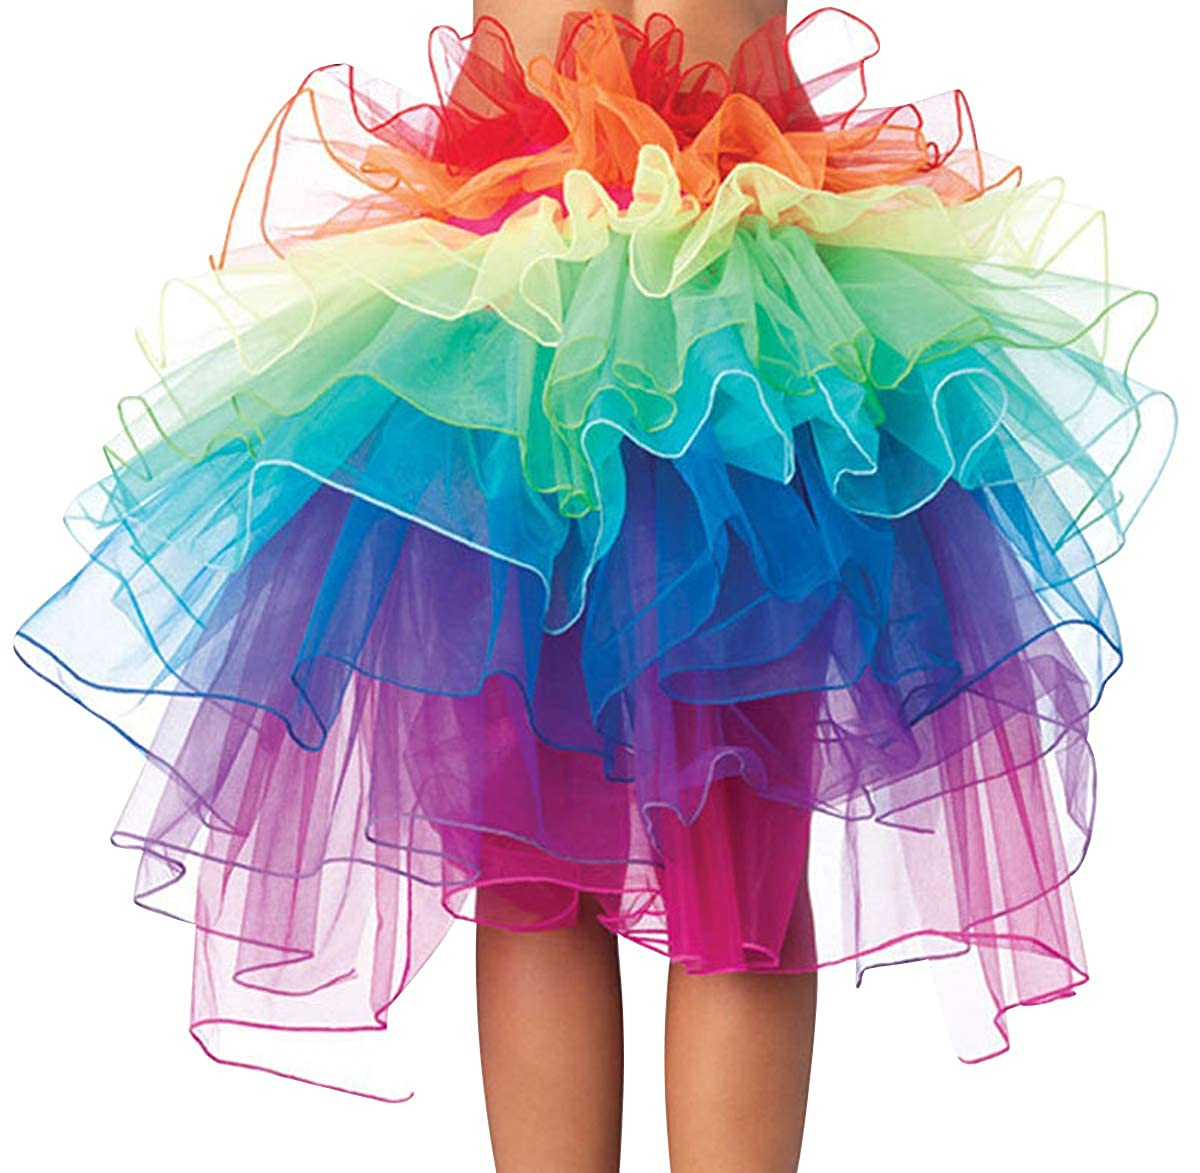 93bb8013a7 Pengniao Falda Tutu Mujer Faldas de Tul Largas Falda Tul Disfraz Fiesta  Larga para Bodas Disfraces con Tutu Ballet ...